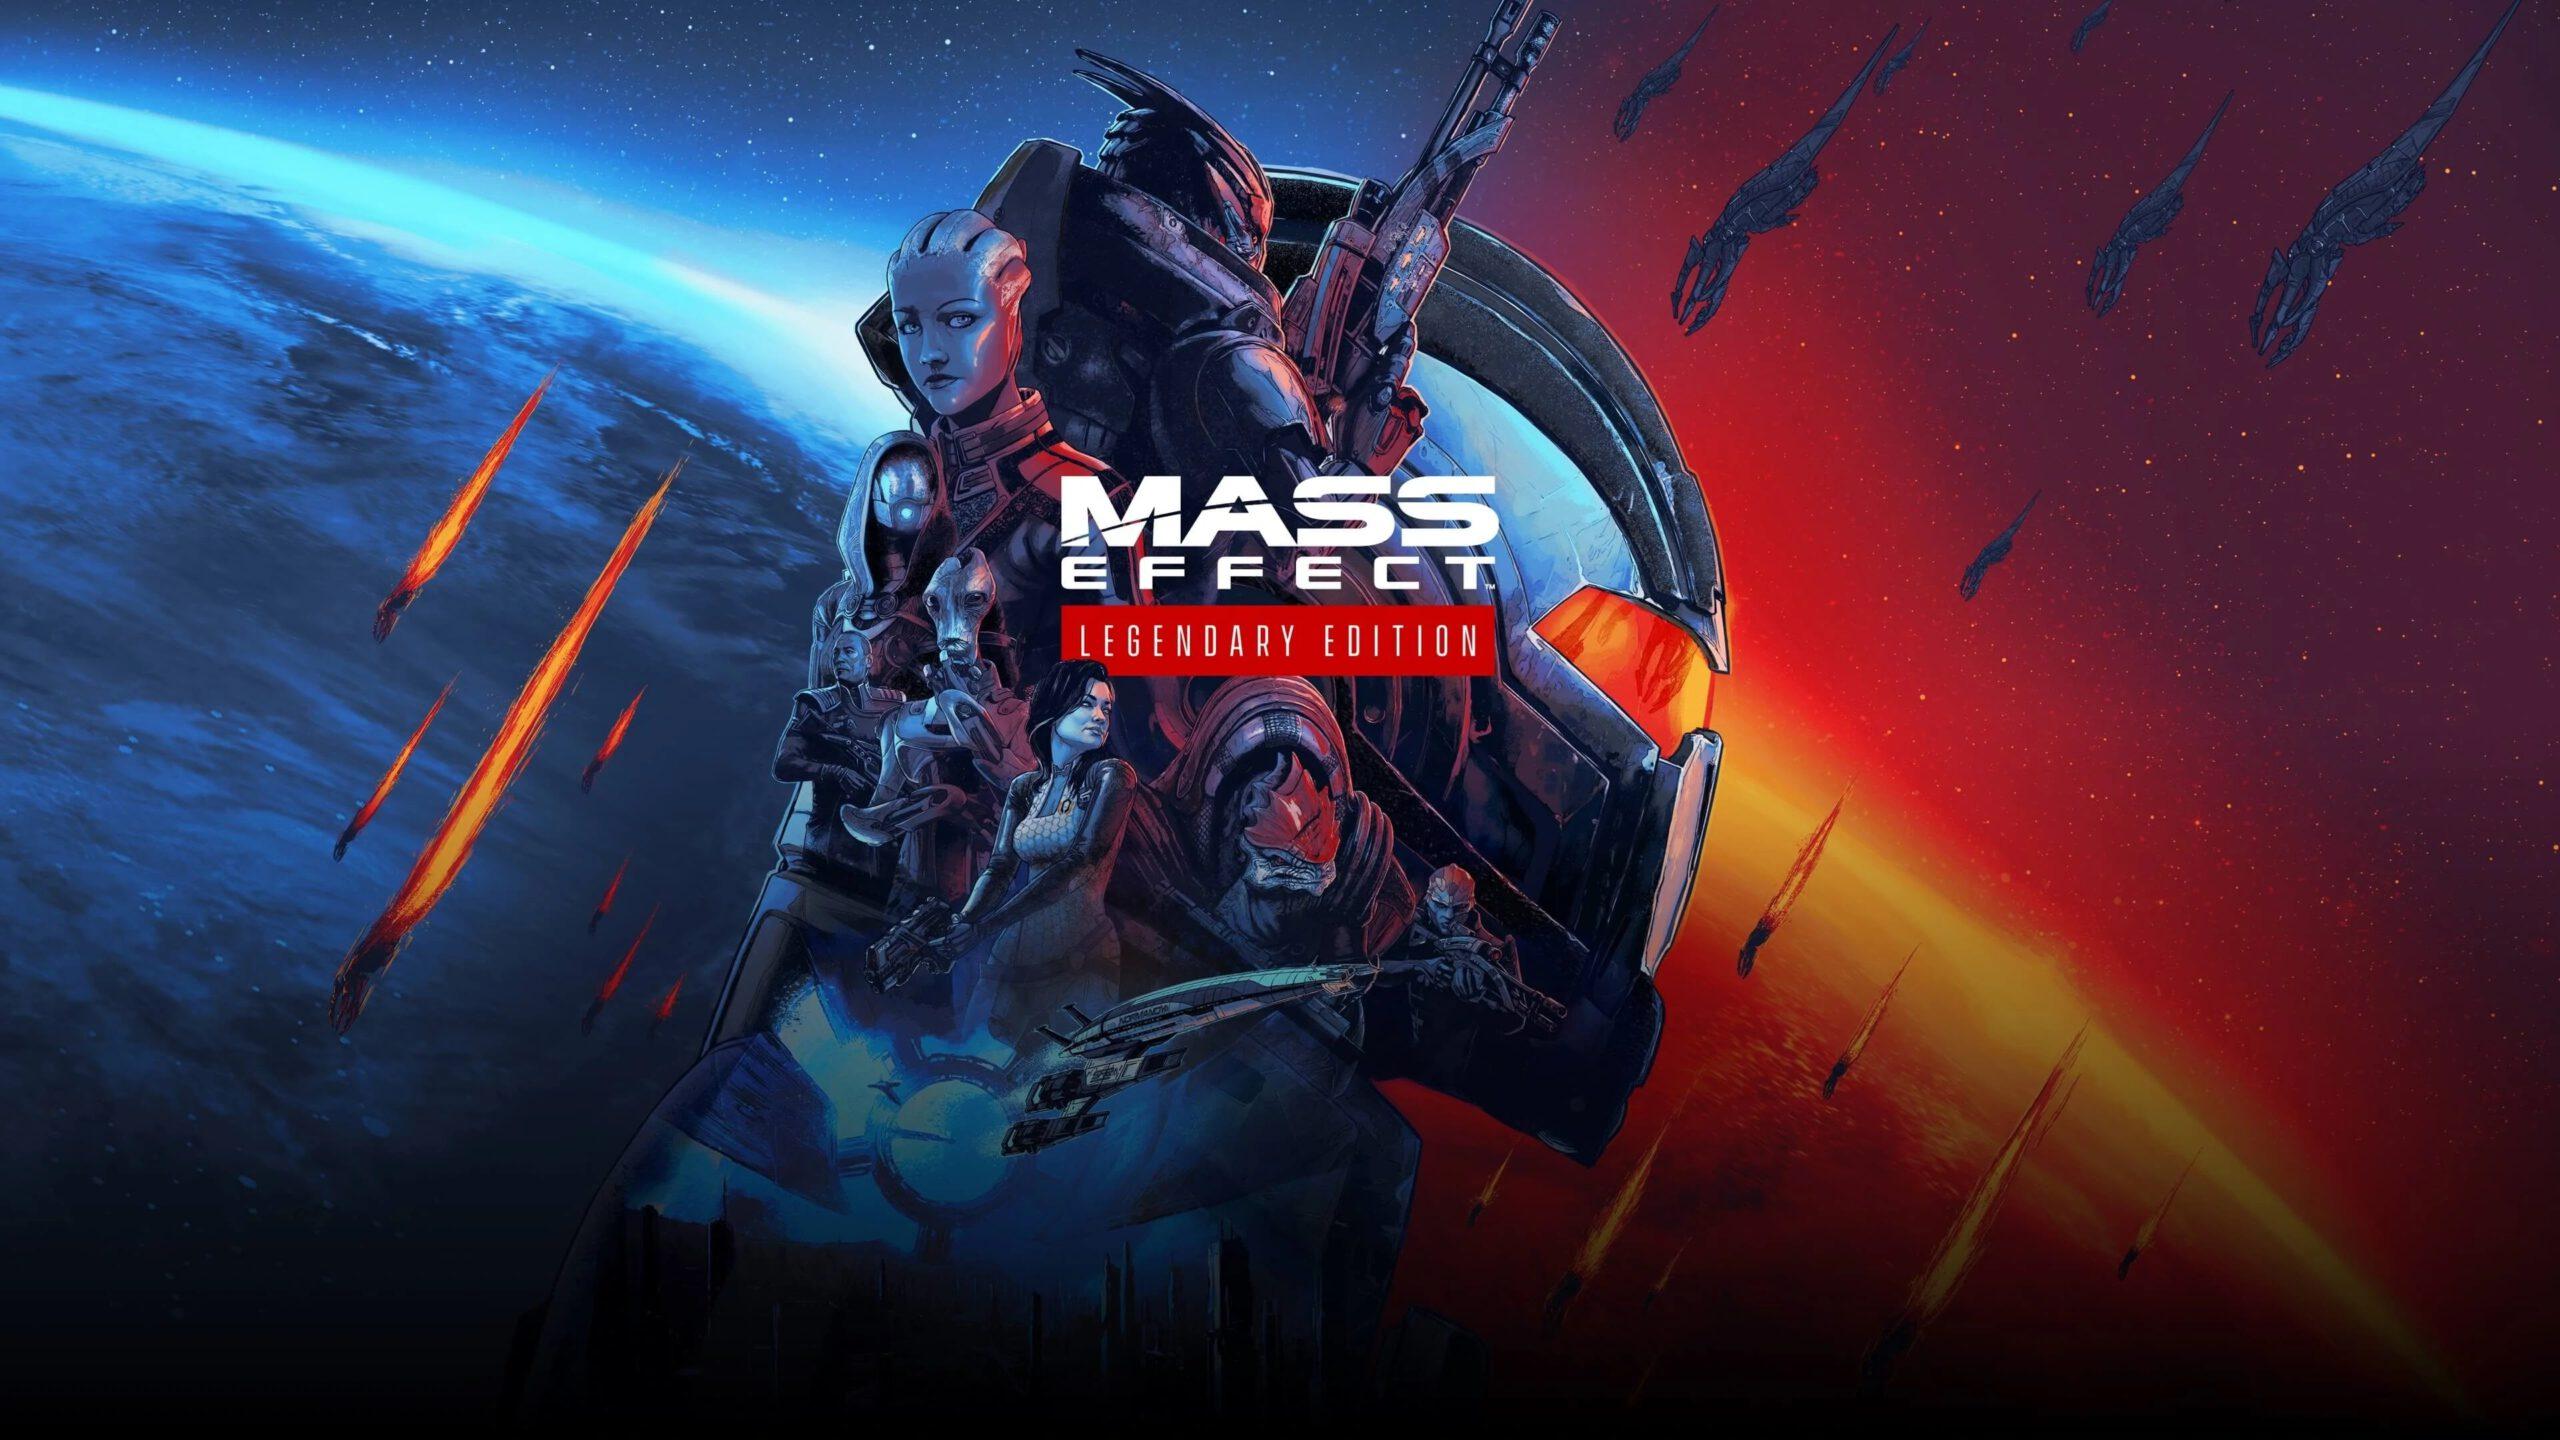 N7-Day 2020: Mass Effect 5 Ankündigung & Legendary Edition